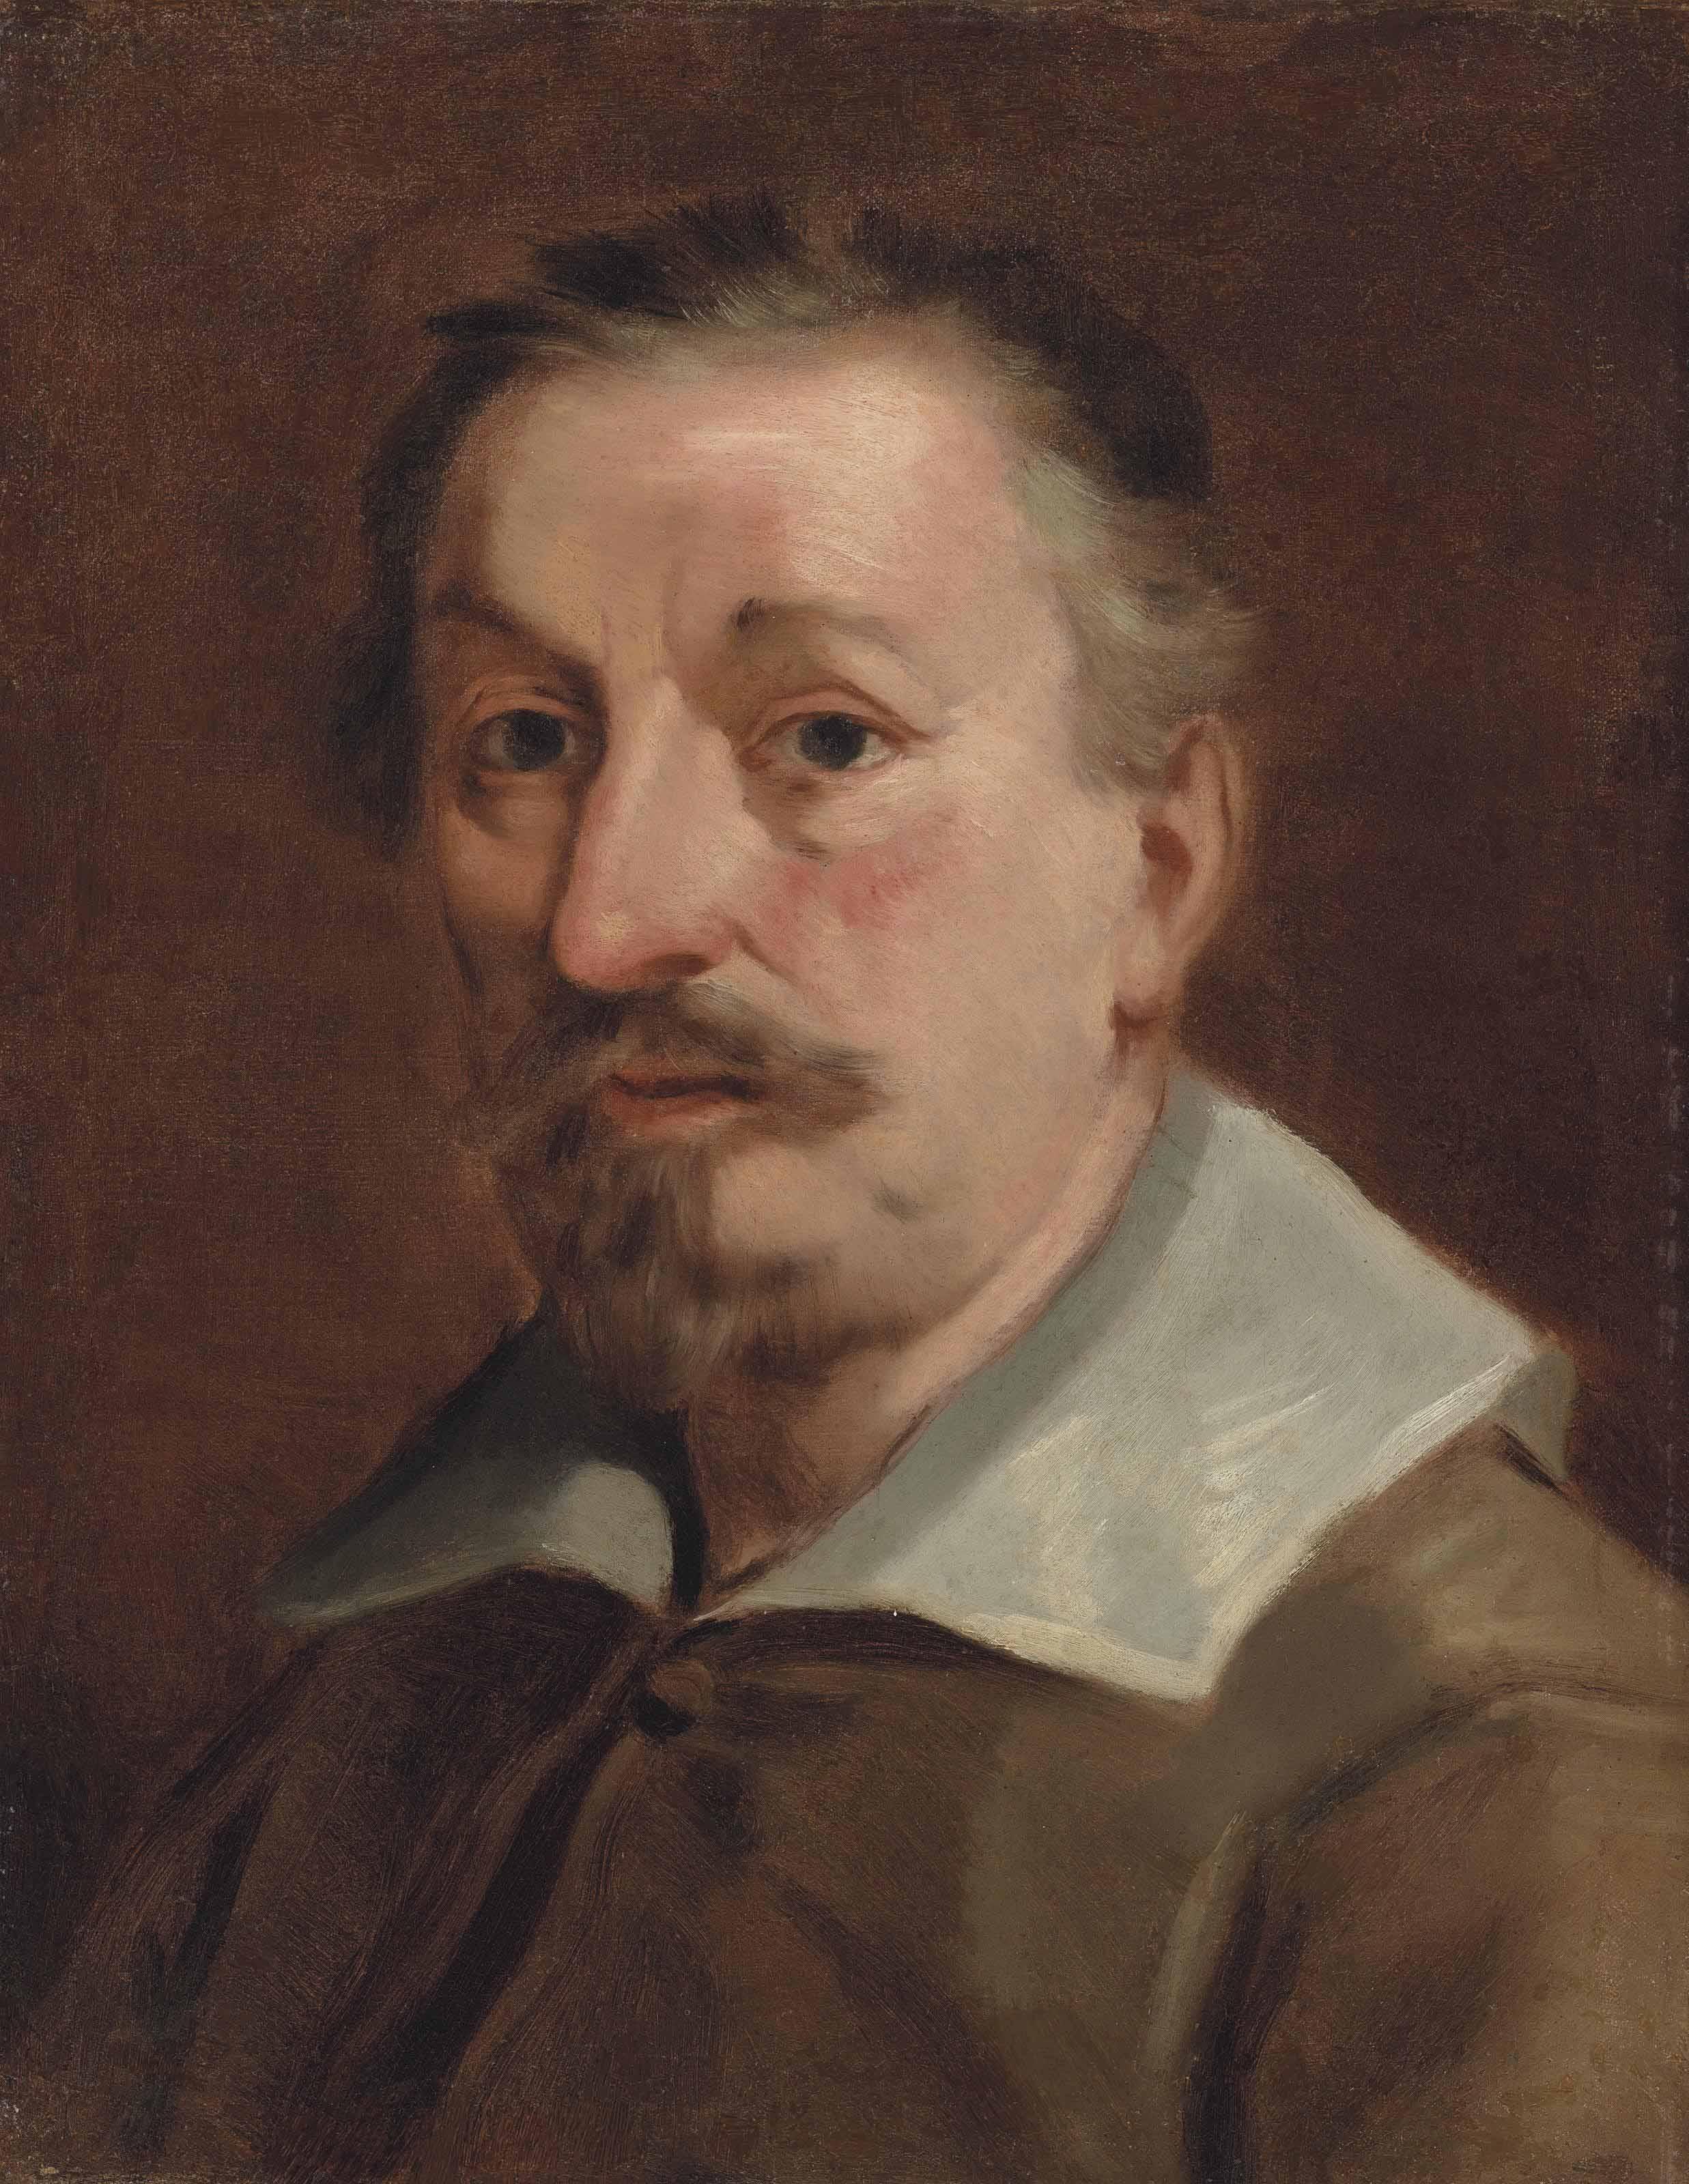 Attributed to Francesco Albani (Bologna 1578-1660)